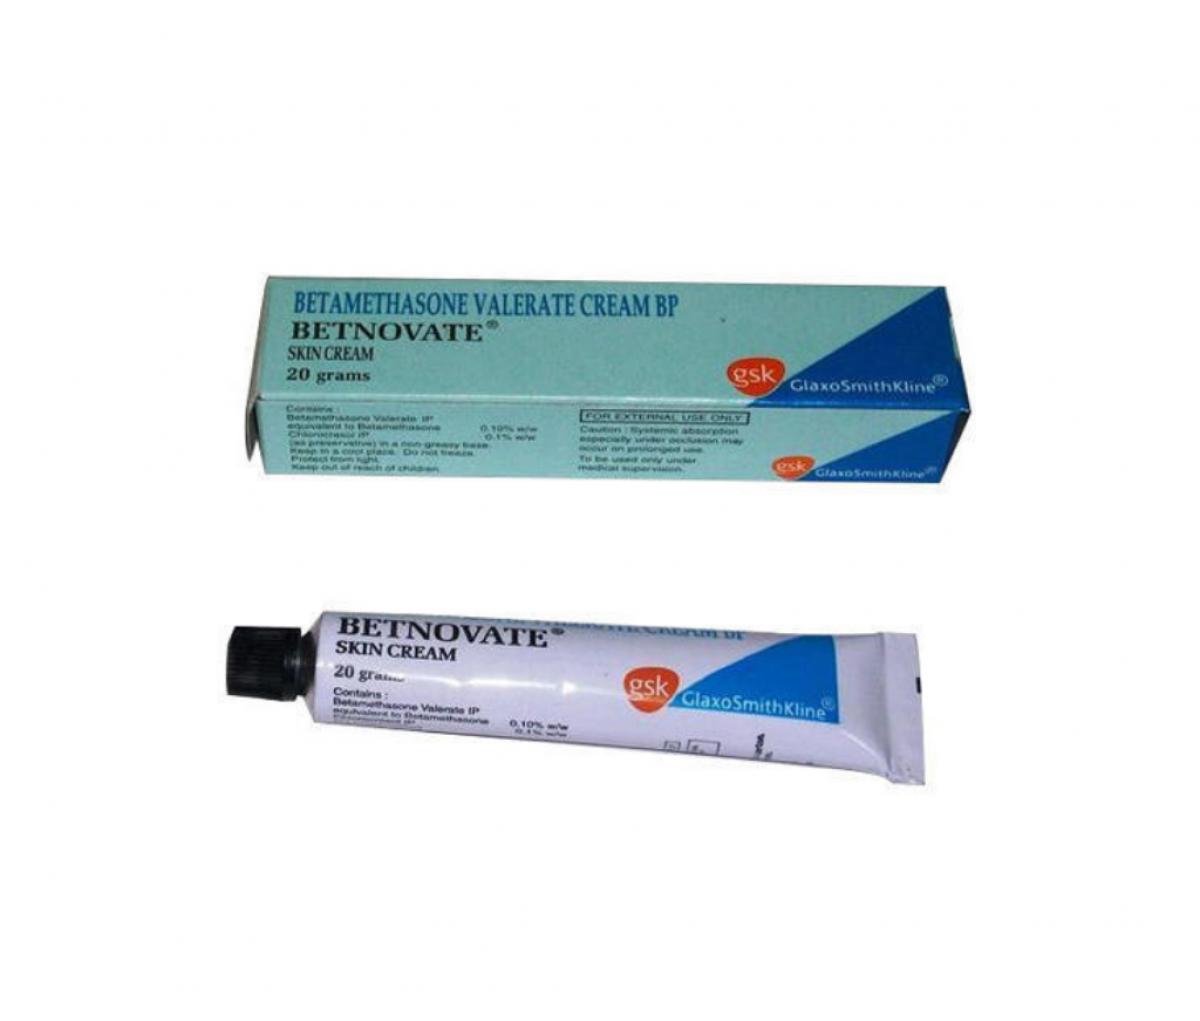 Betnovate 0.1% Cream 20g - India